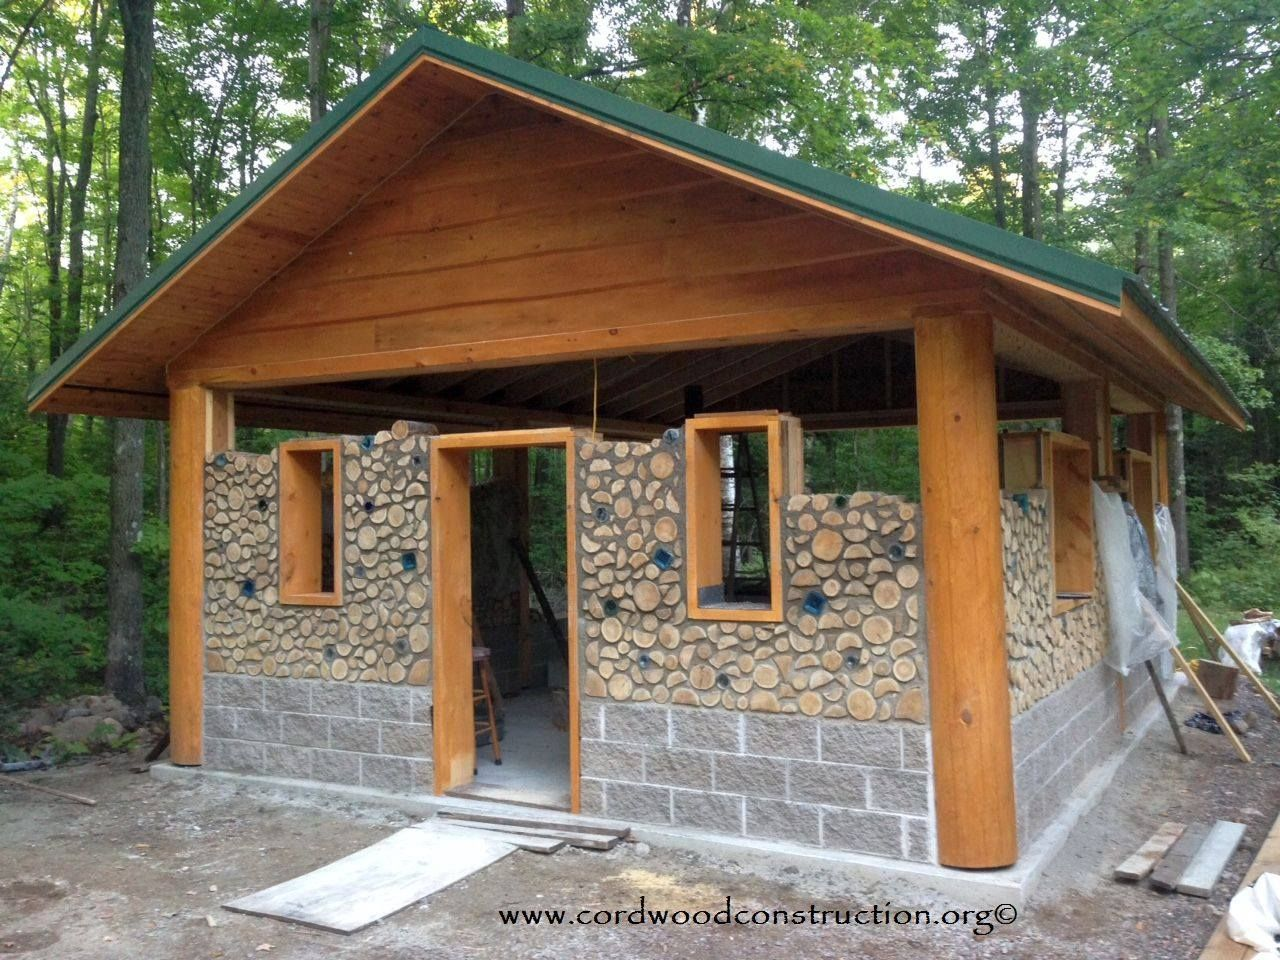 Cordwood Log Homes - Woodshop Projects Misc